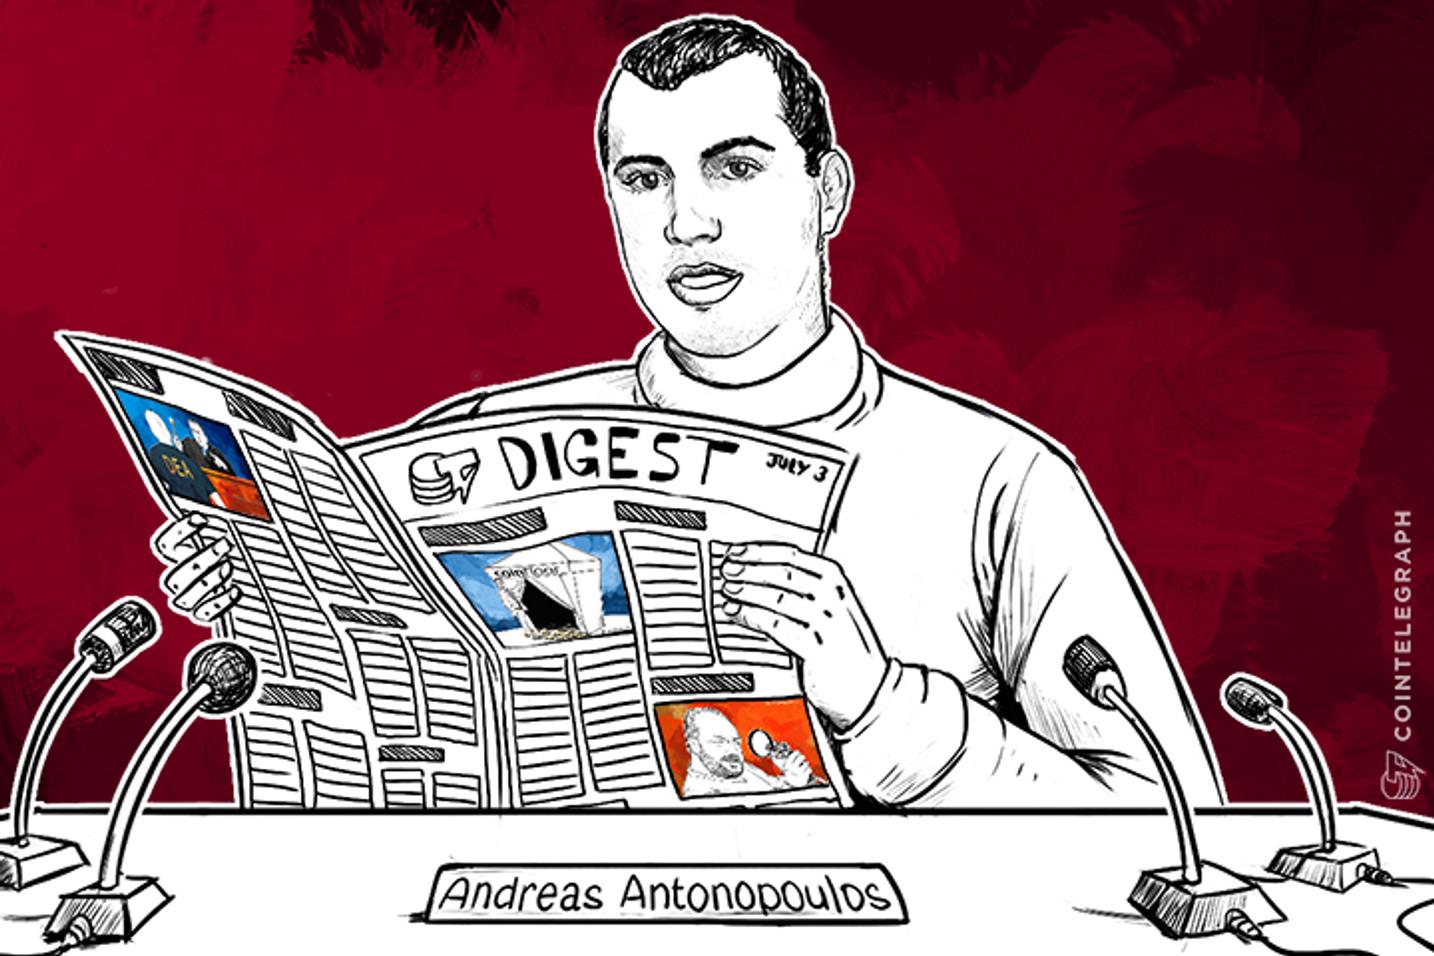 JUL 3 DIGEST: Escort Teaches Other Escorts about Bitcoin; BNP Paribas Calls Bitcoin a Disruptive Invention